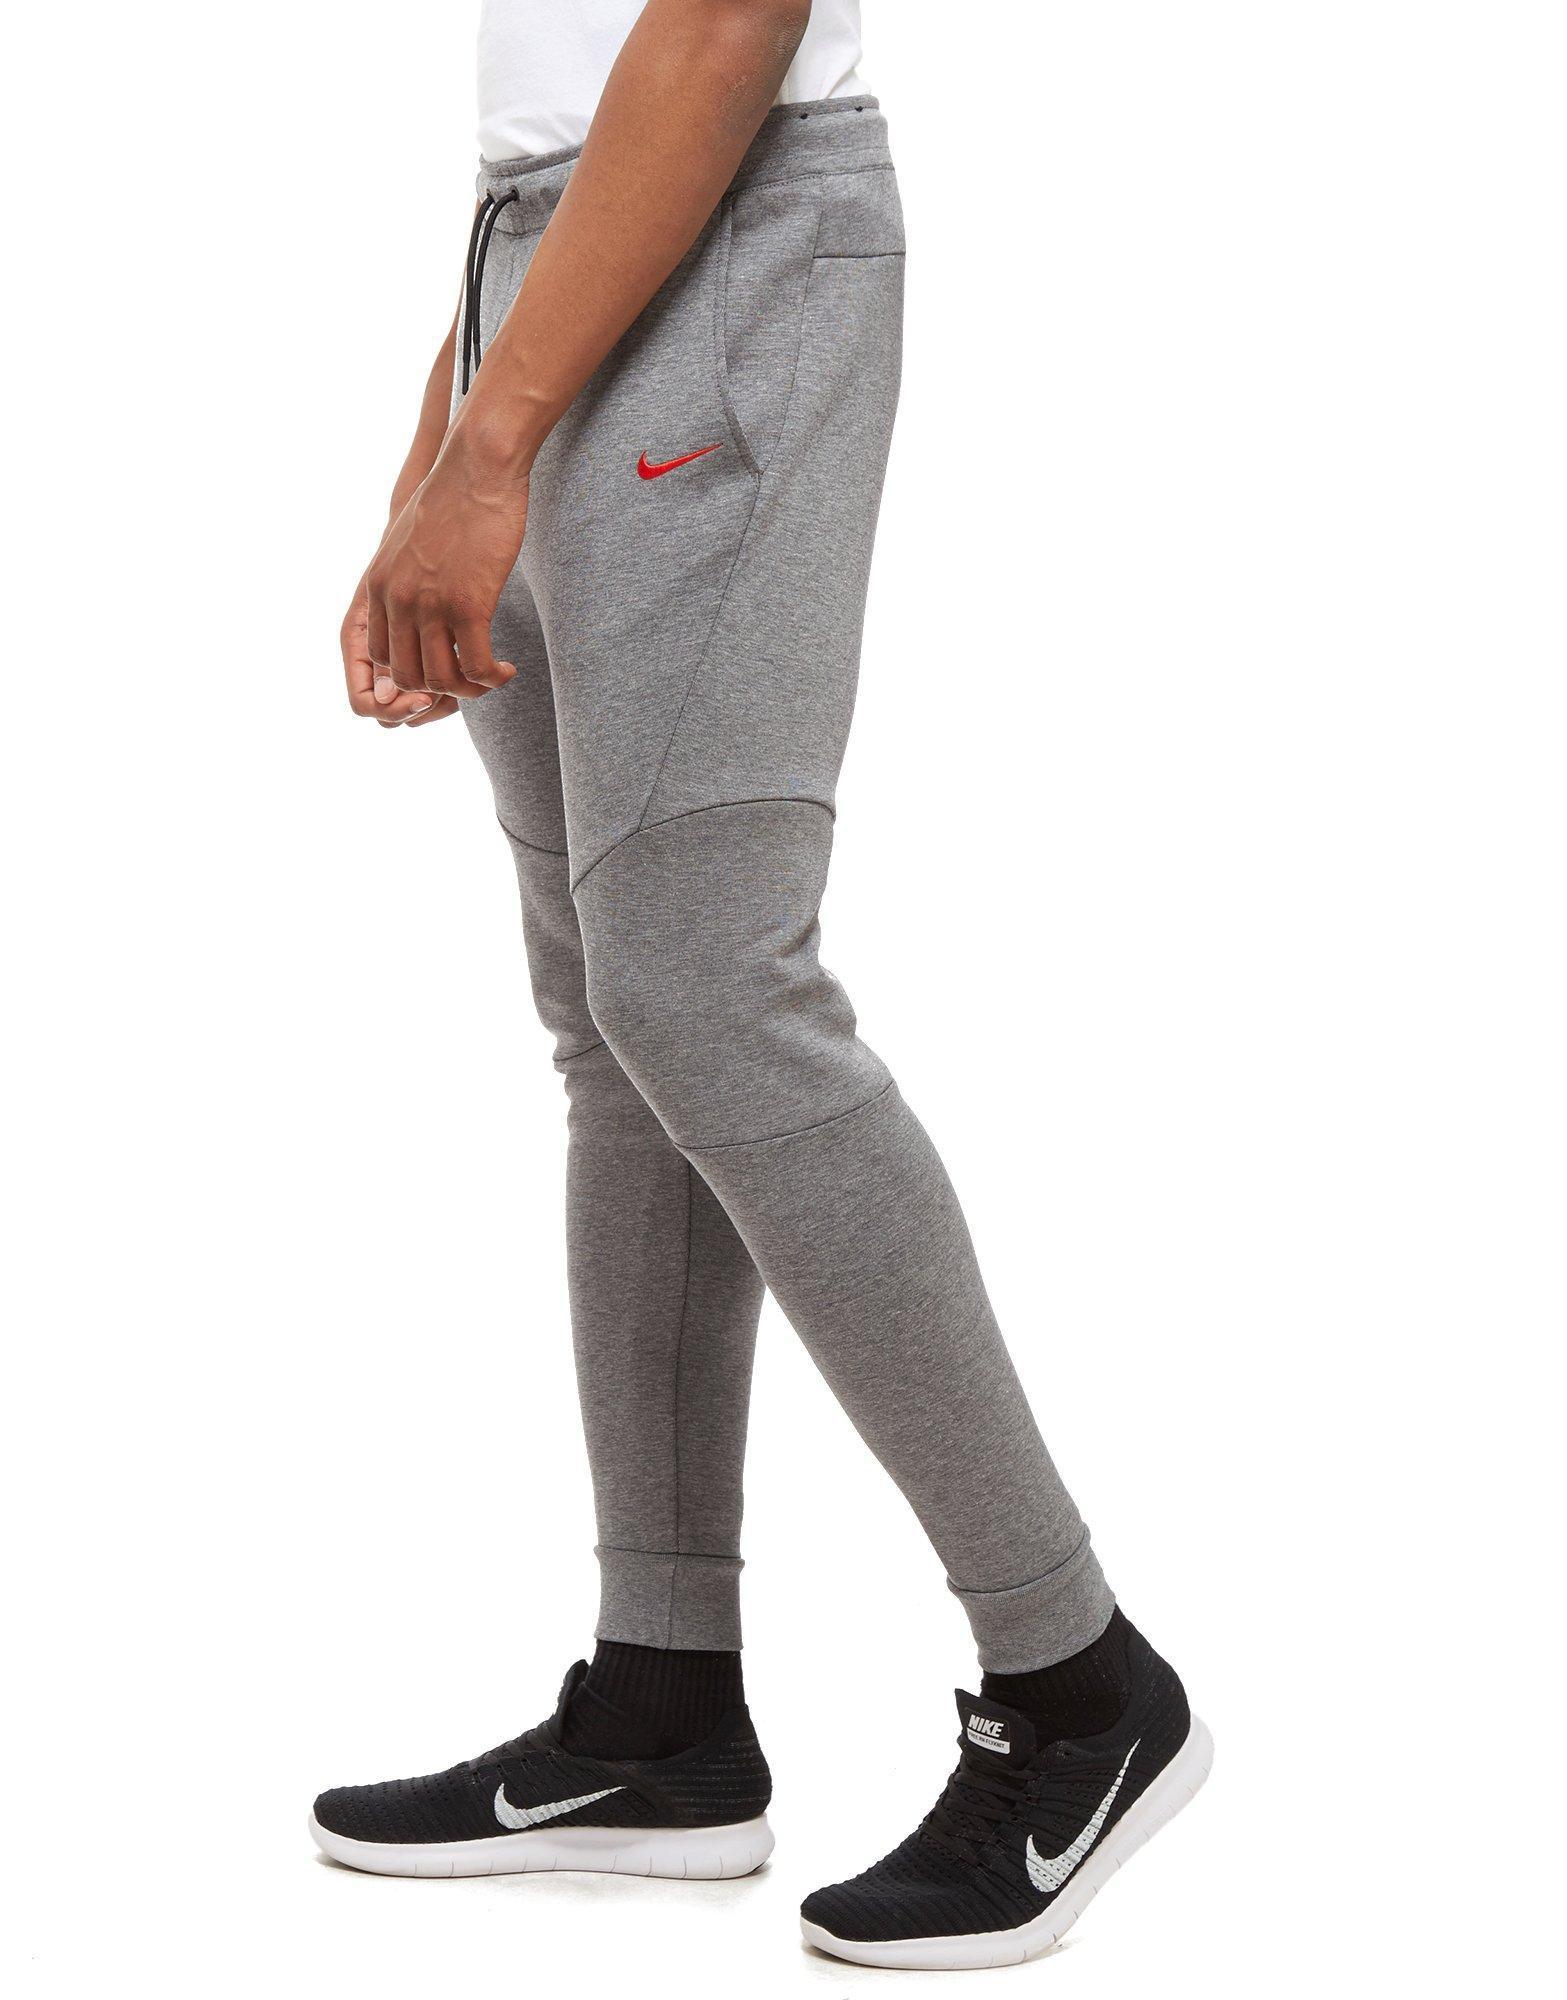 Fleece Germain In Paris Lyst Saint Nike Pants Tech For Gray Men BOIRwUq a17c4fb8f